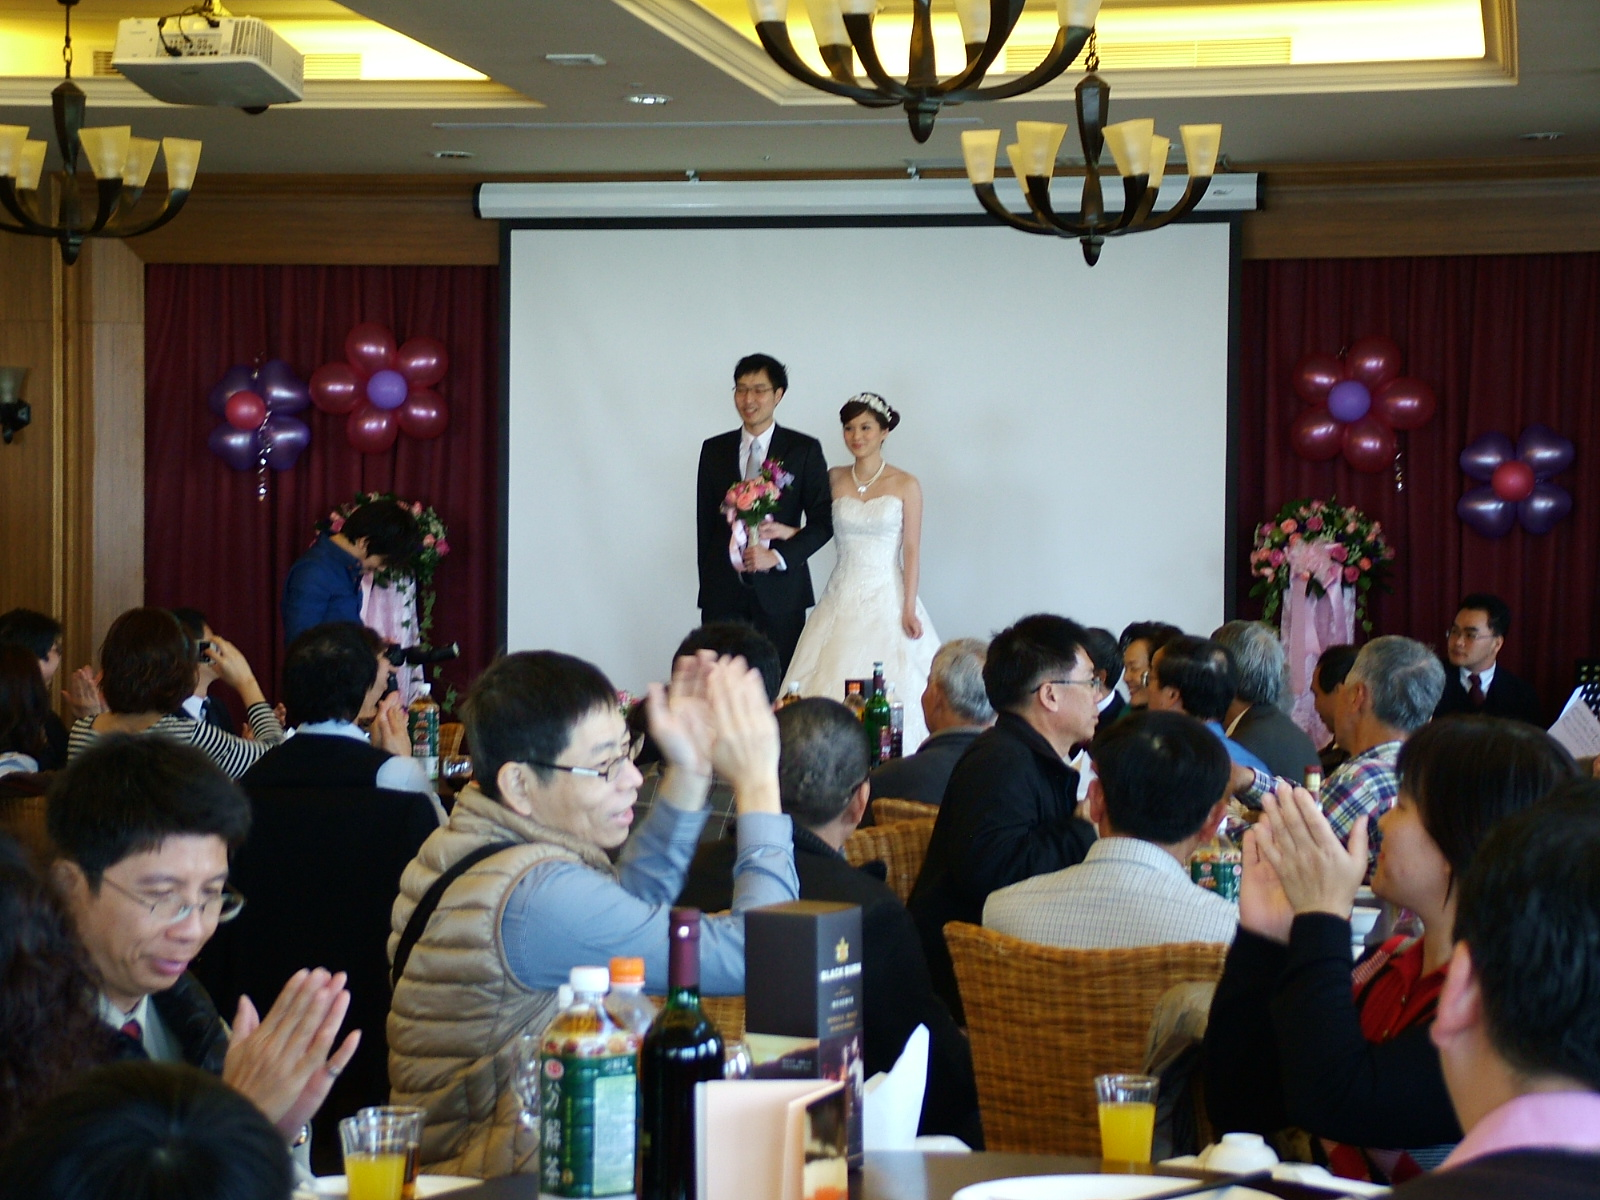 Stile di appuntamenti taiwanesi